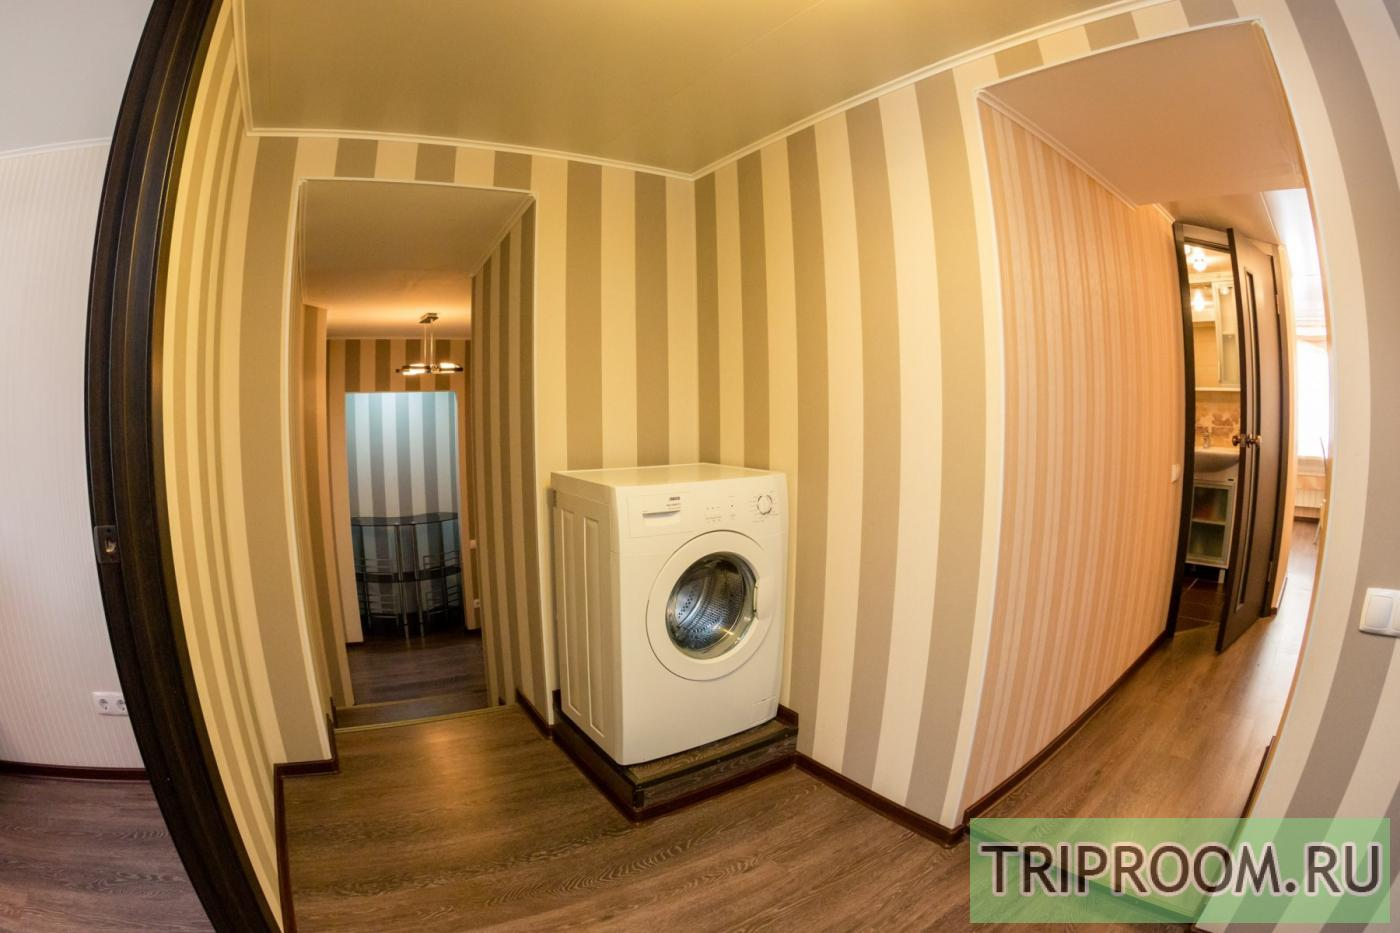 2-комнатная квартира посуточно (вариант № 33340), ул. Виленский переулок, фото № 8